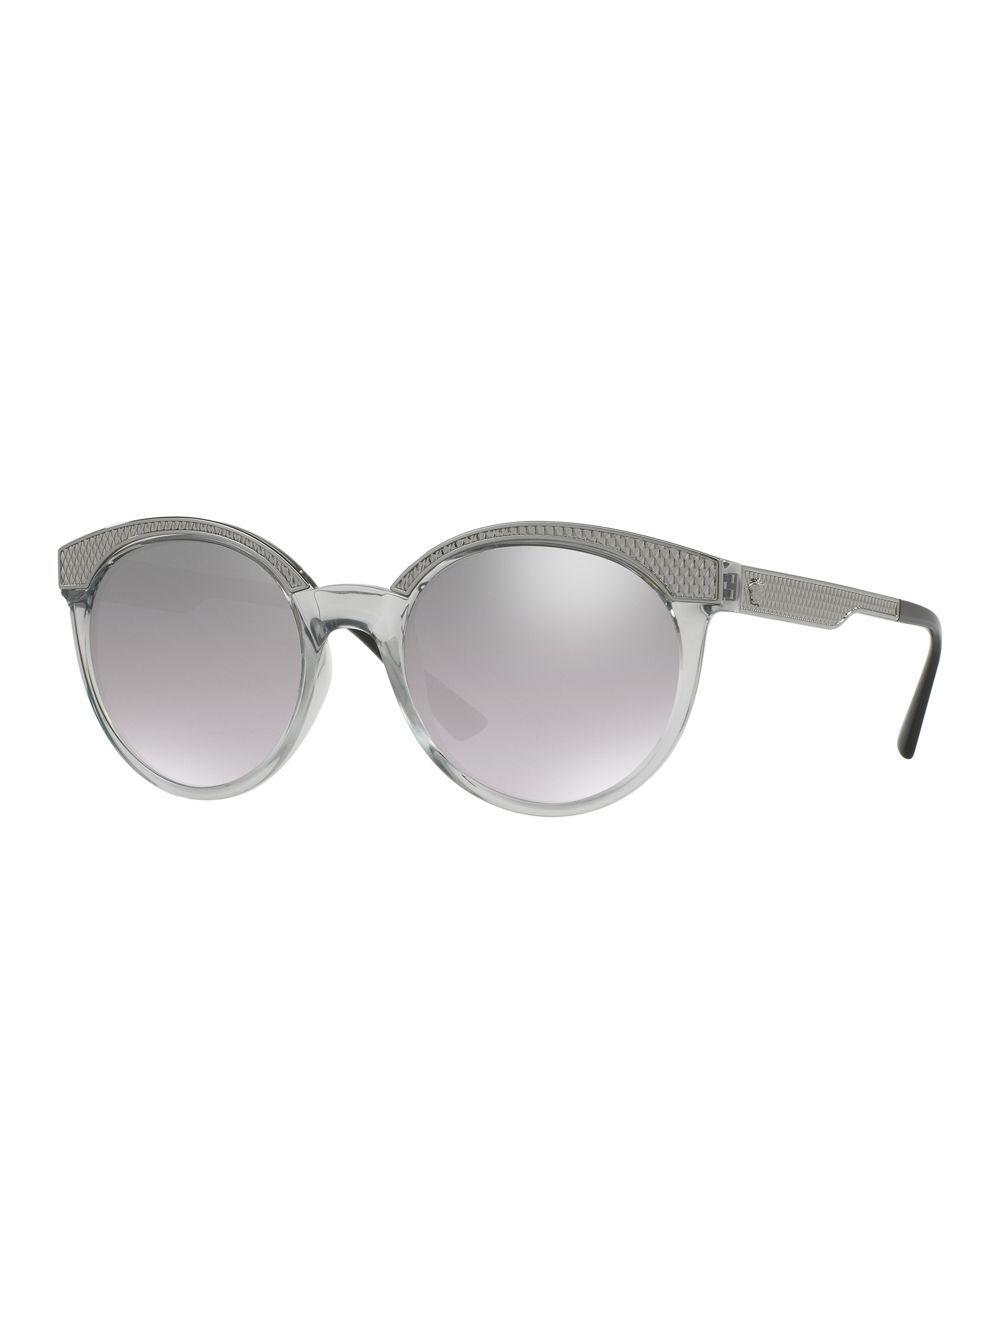 45d41c2b468 Lyst - Versace 53mm Round Sunglasses in Gray